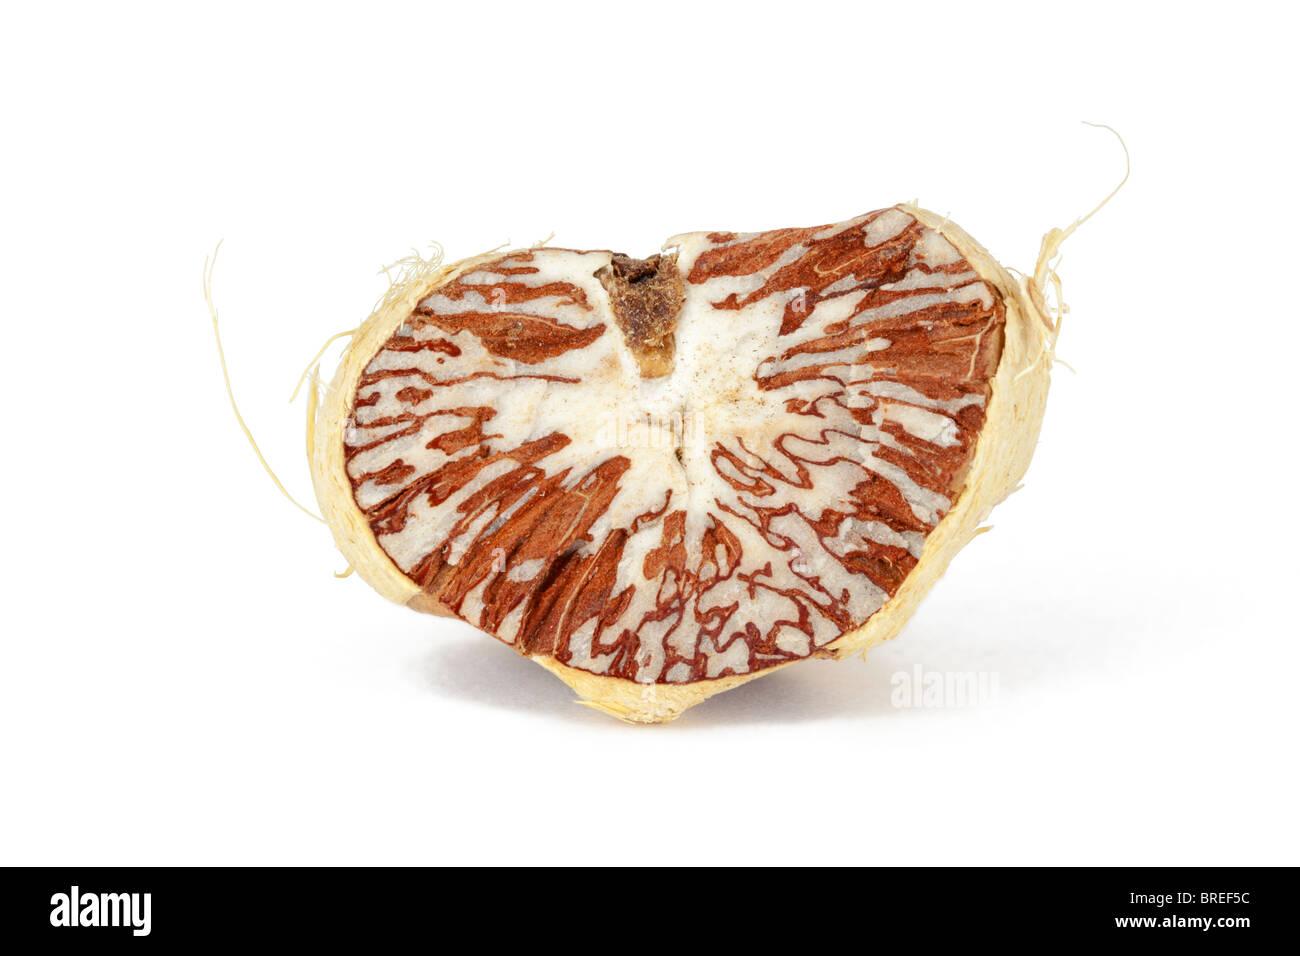 betel nut on a white background - Stock Image